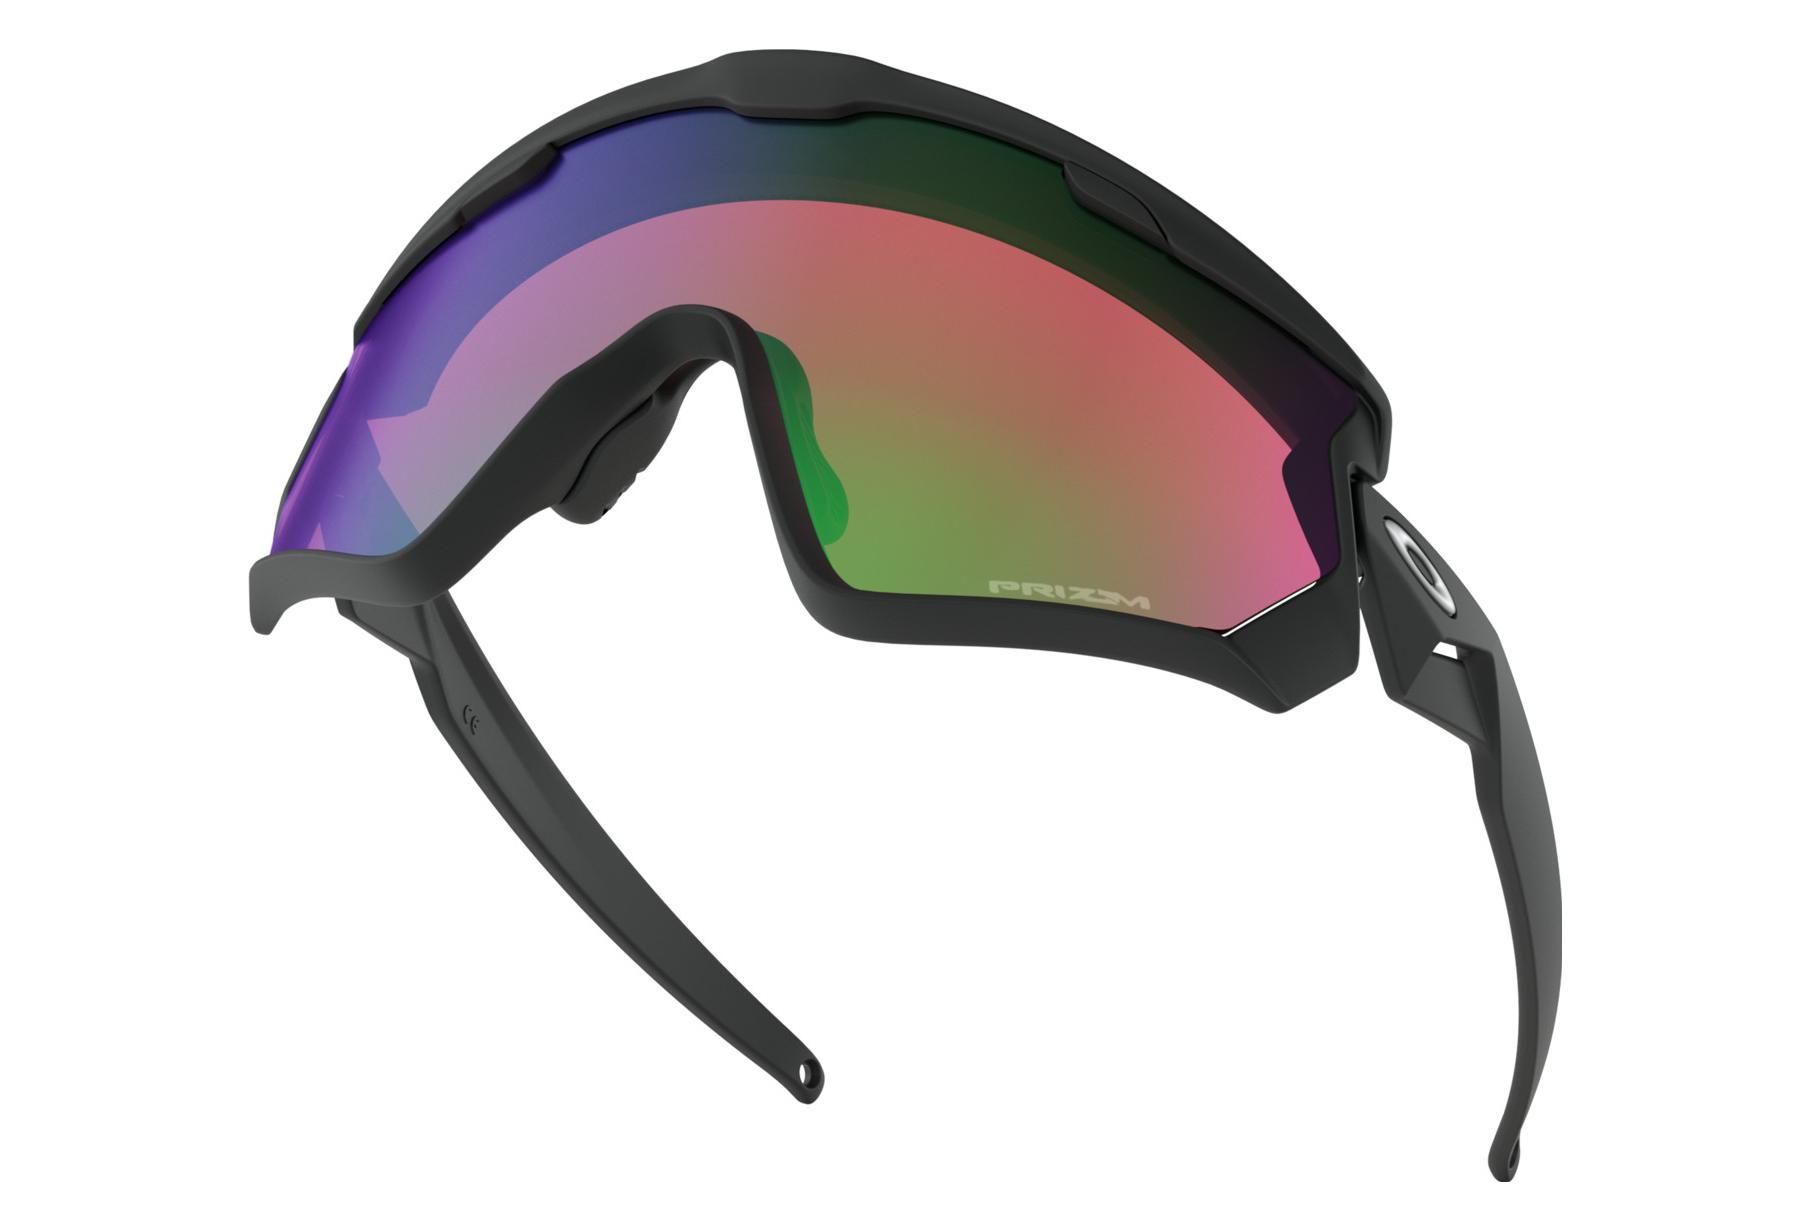 2da51d954 Oakley Sunglasses Wind Jacket 2.0 / Matte Black/ Prizm Snow Jade Iridium /  Ref : OO9418-0145